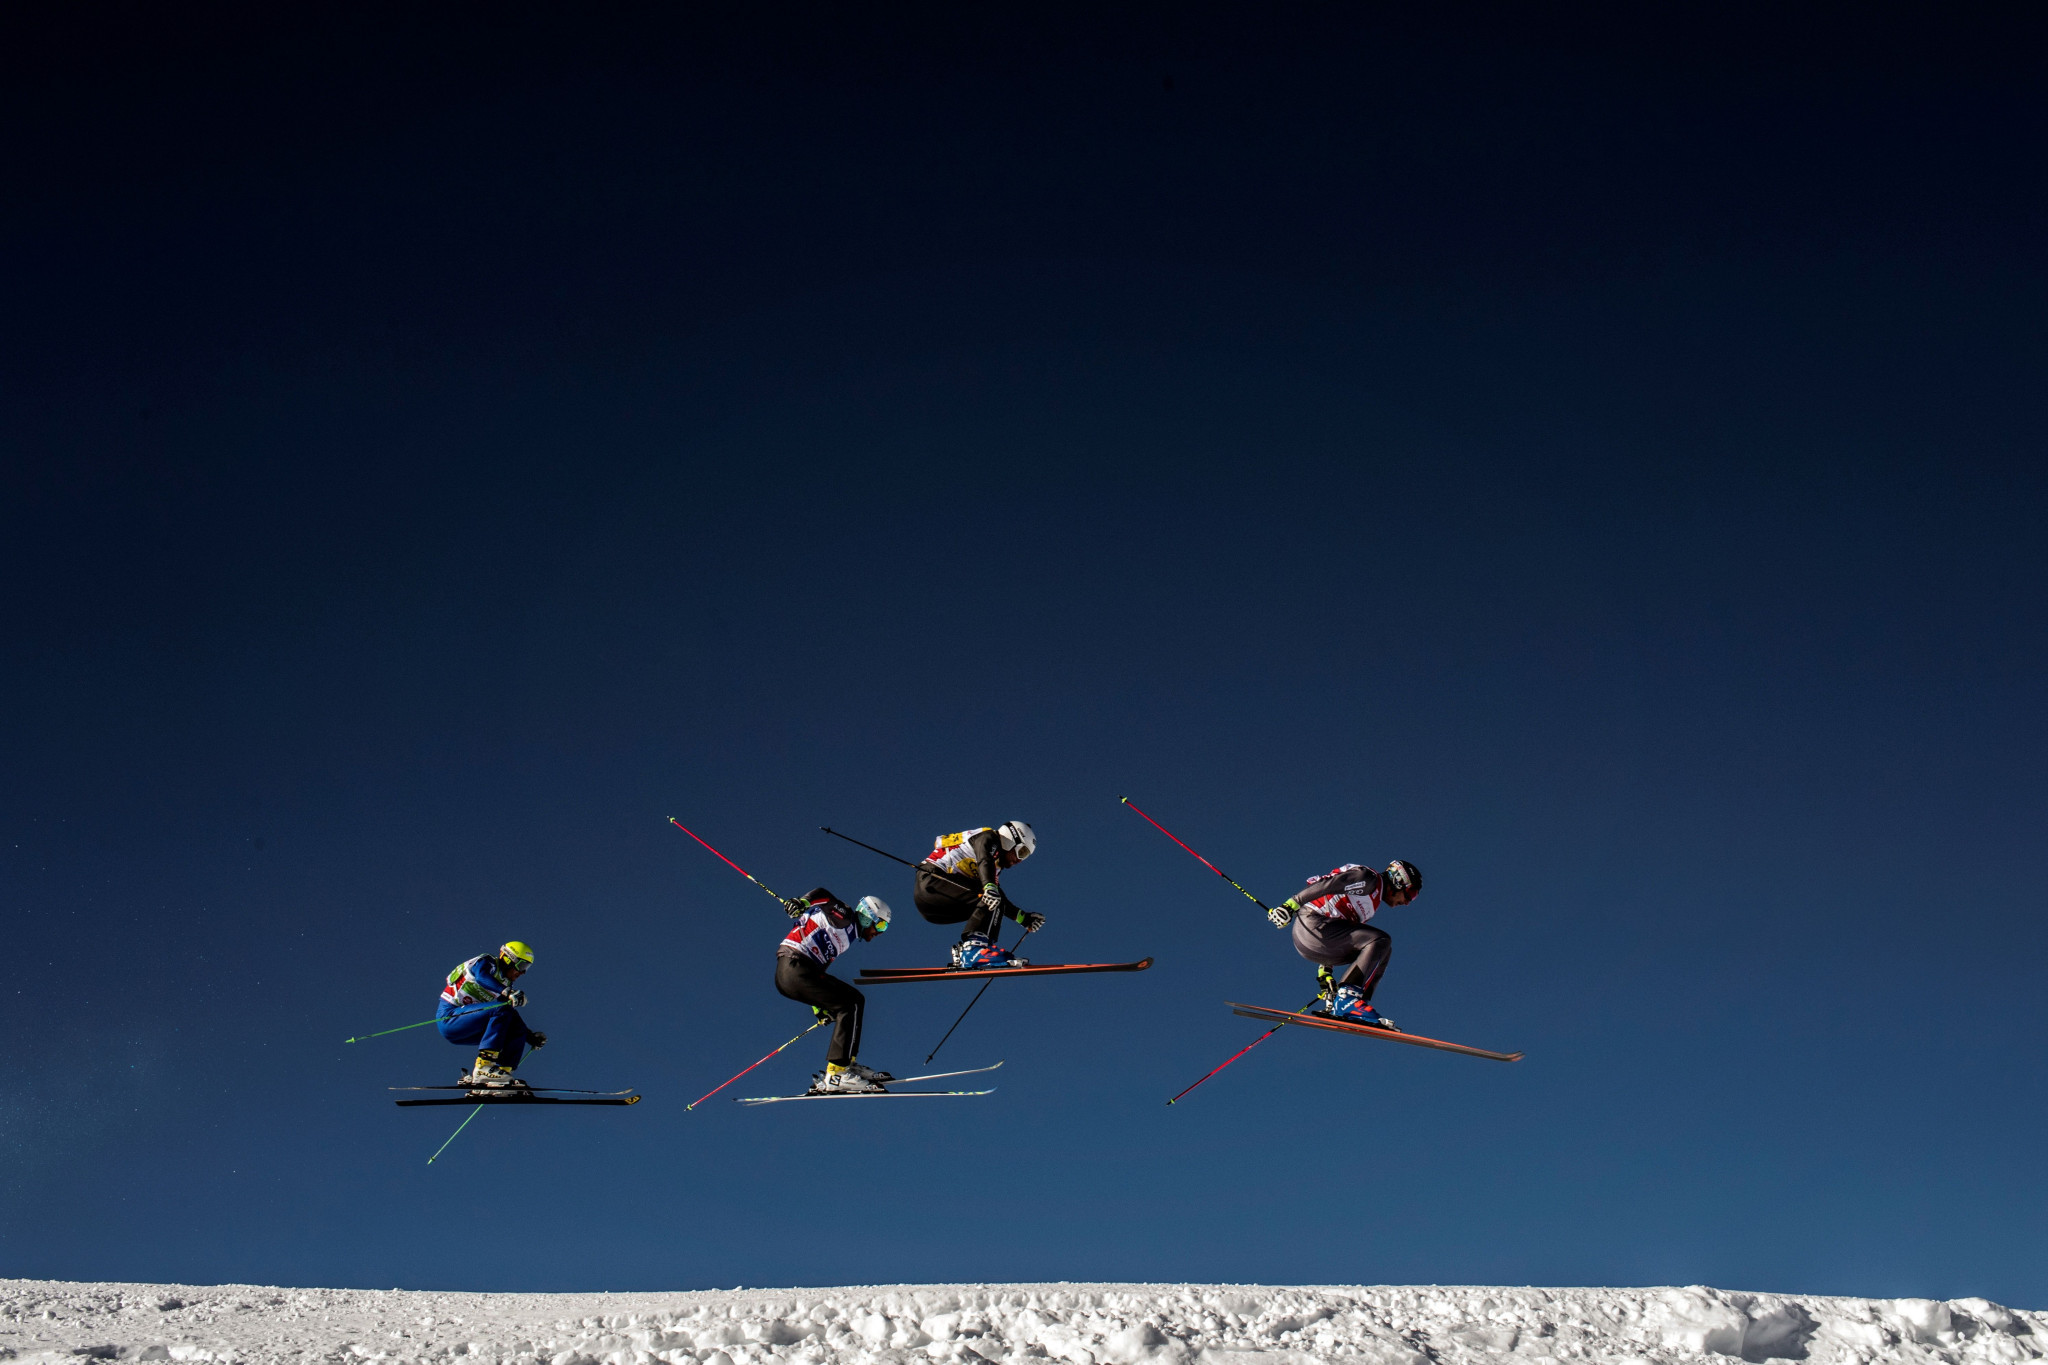 FIS race directors visit Reiteralm cross course following World Cup debut